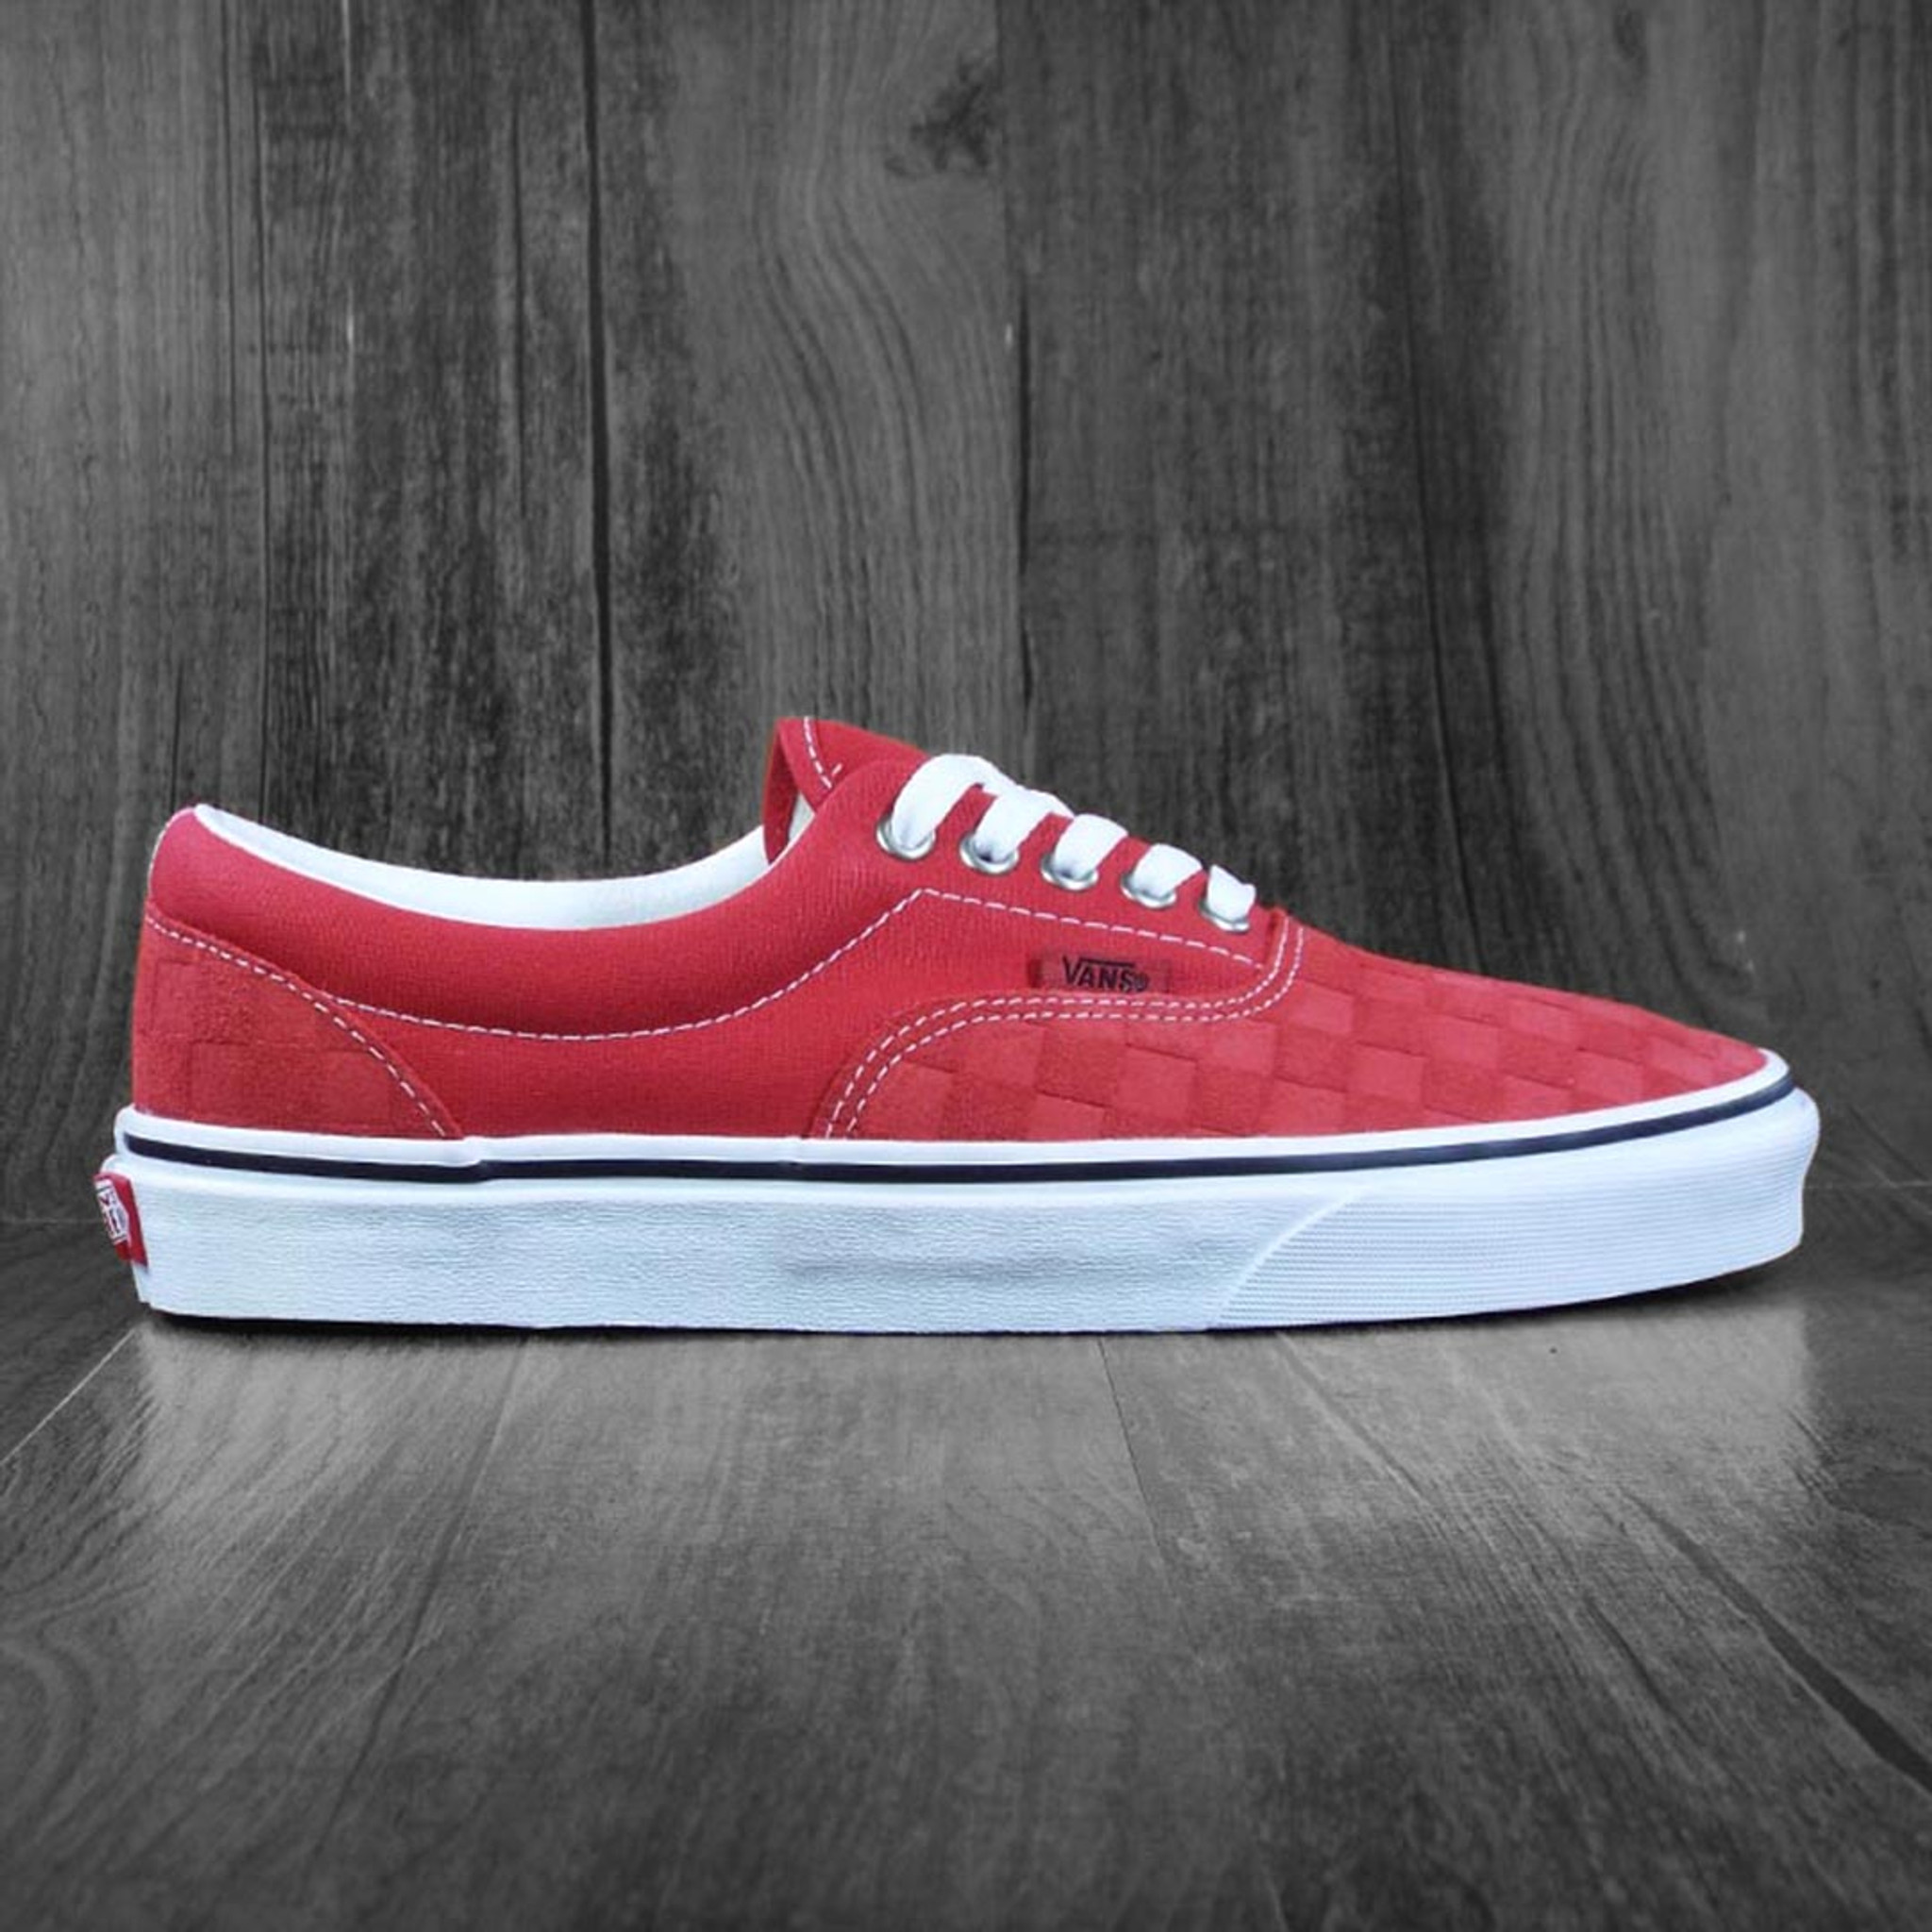 Vans Era Skate Shoes - Deboss Pomp Red